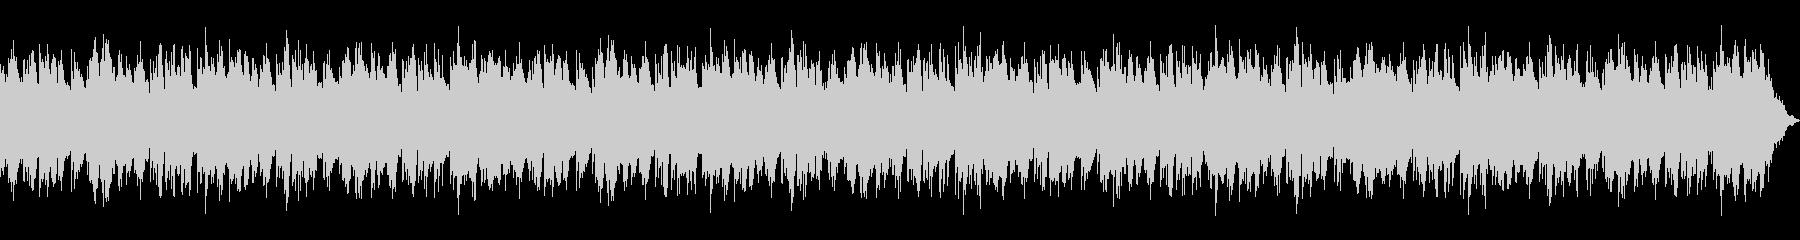 CM・ショートムービー 癒されるピアノの未再生の波形